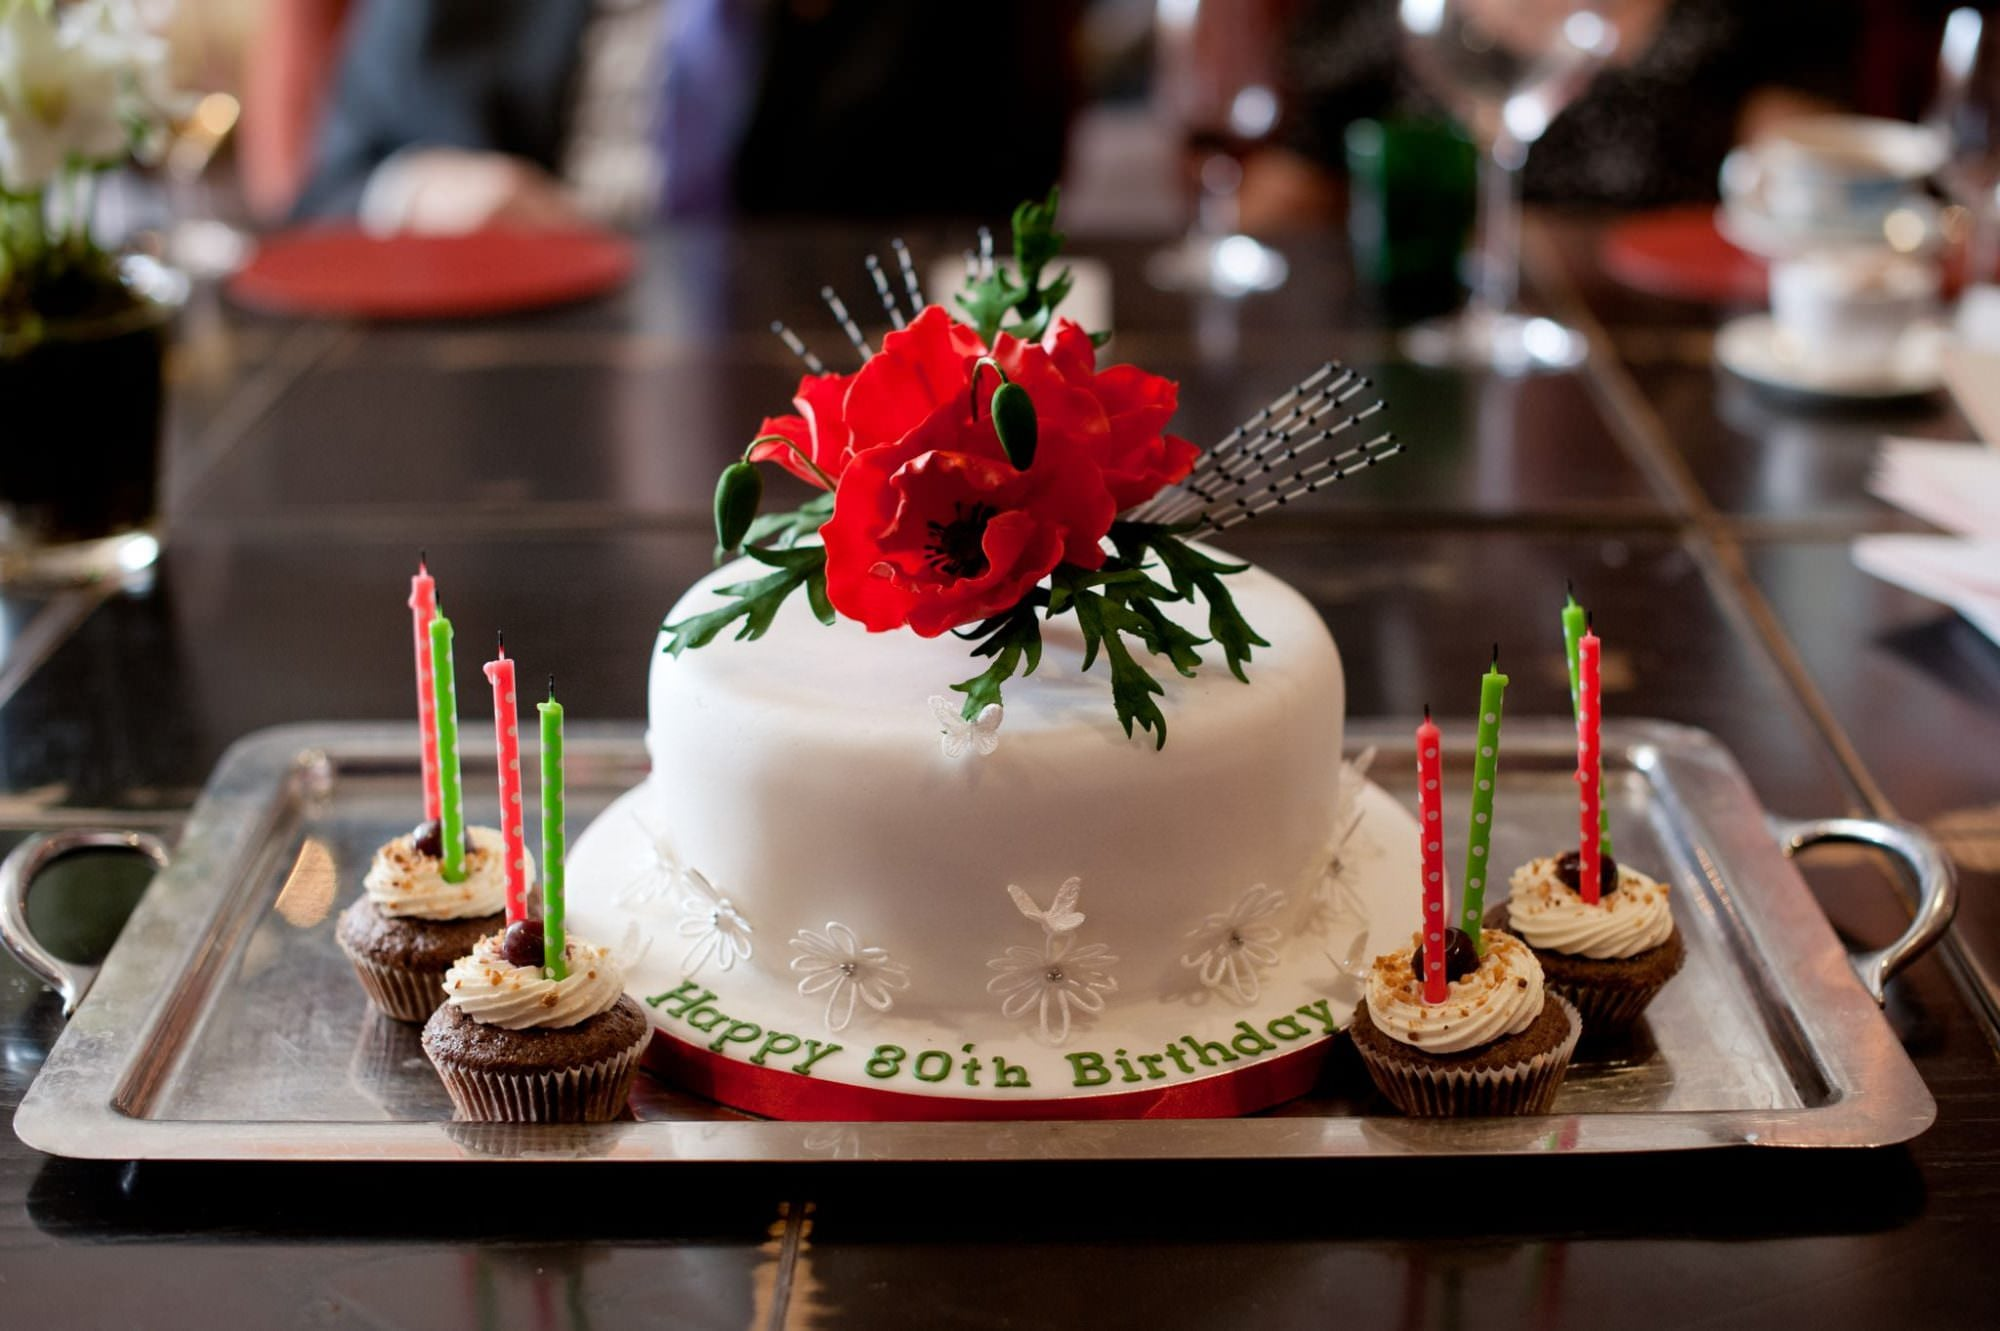 Ringwood Birthday Celebration Cake